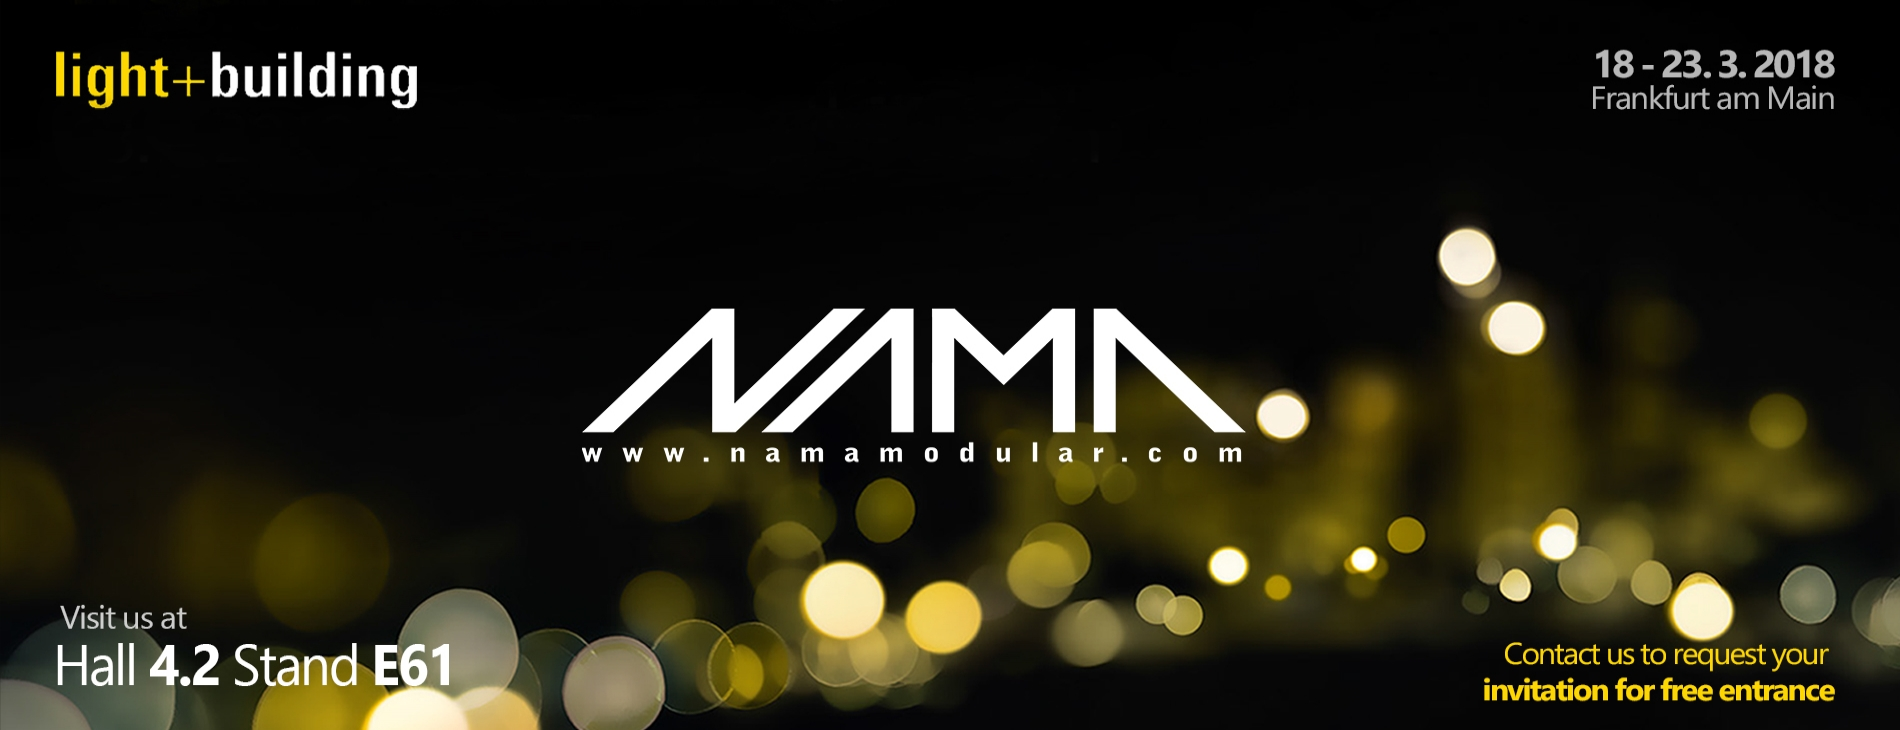 http://www.namamodular.com/news/post/light-building-2018/